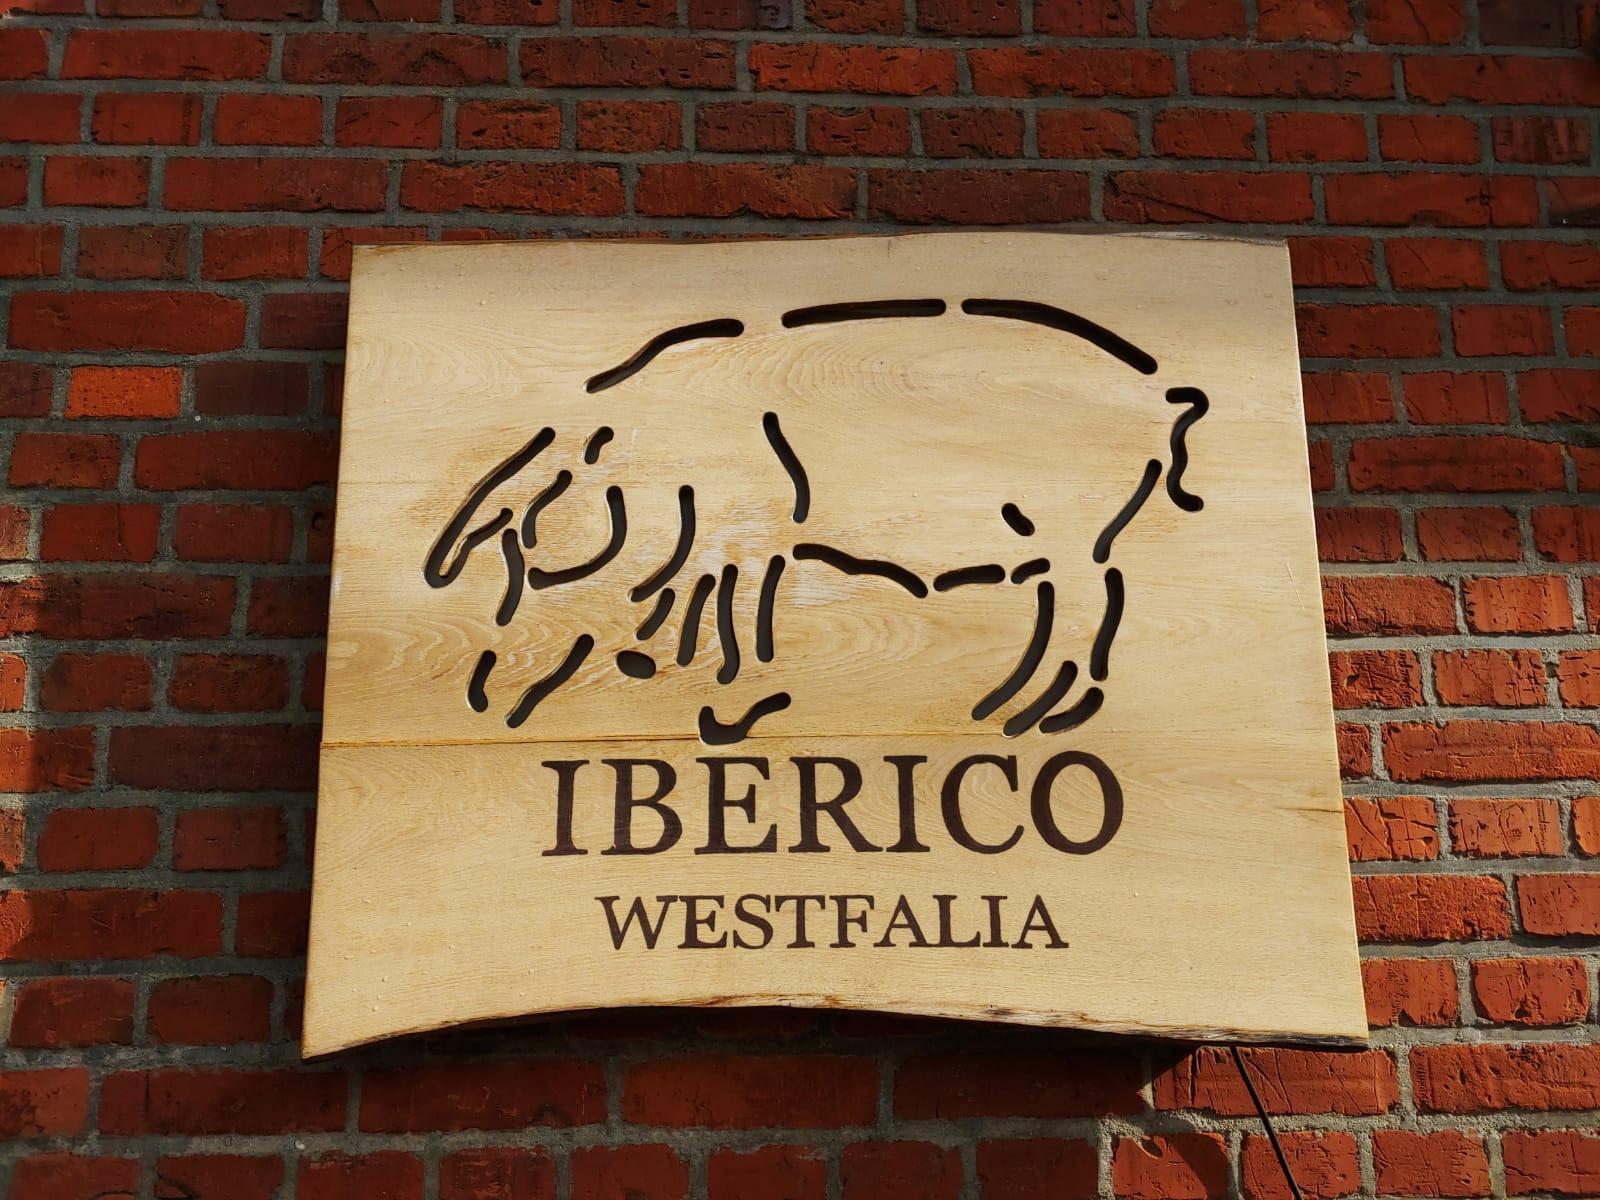 Besuch bei Iberico Westfalia